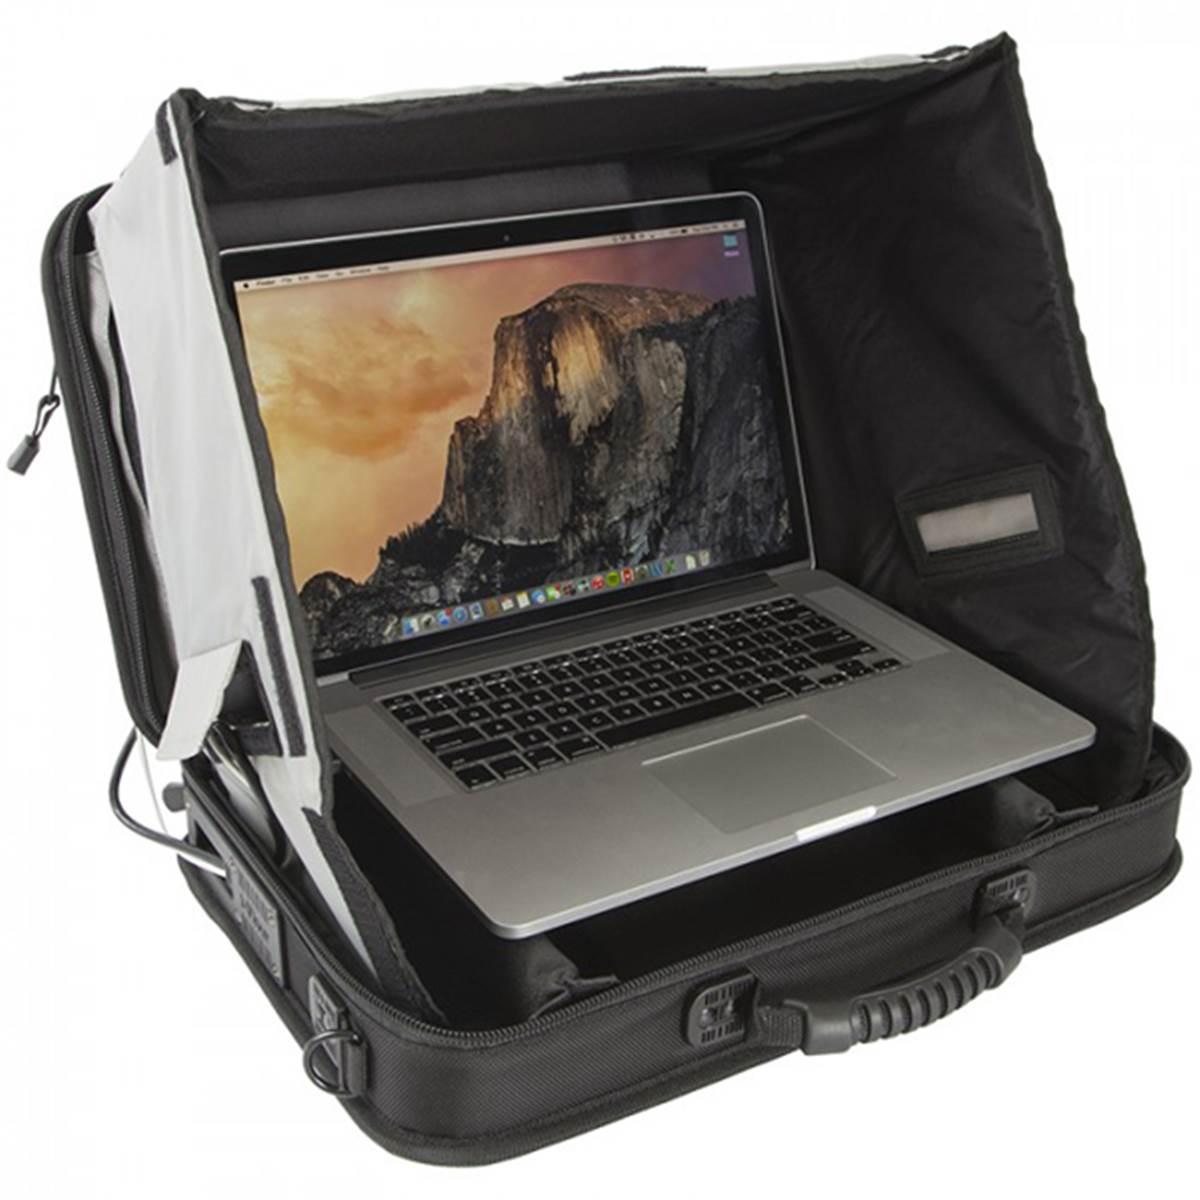 Seaport sac i visor pro mag 15 17 prophot for Visiere ecran ordinateur